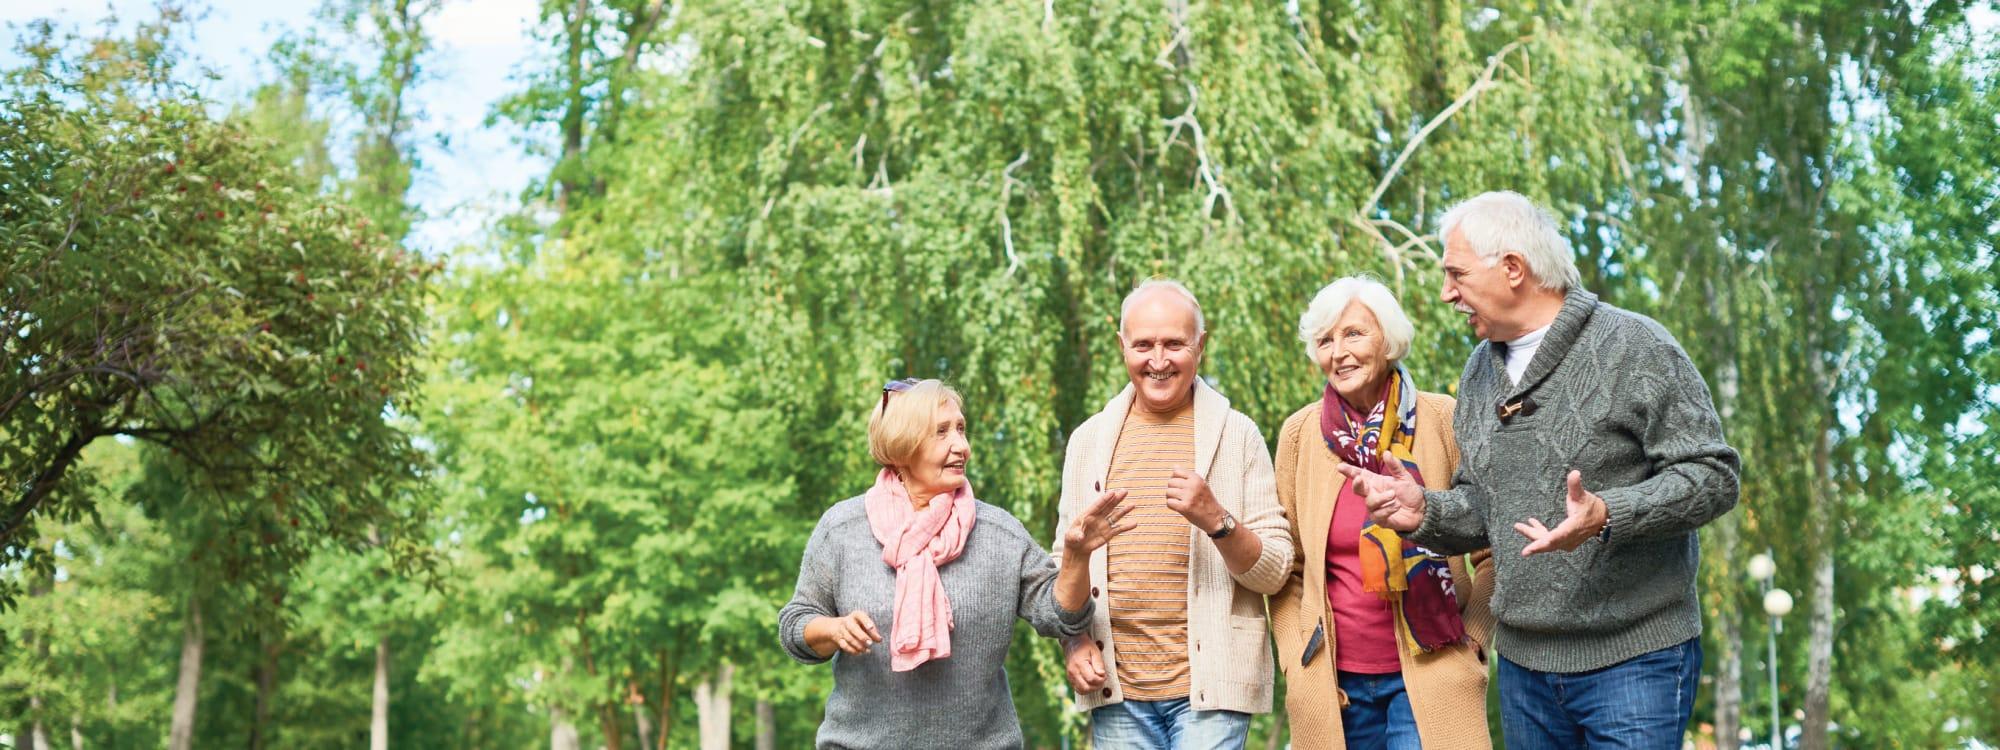 Community Search - Active 55+ at Ebenezer Senior Living